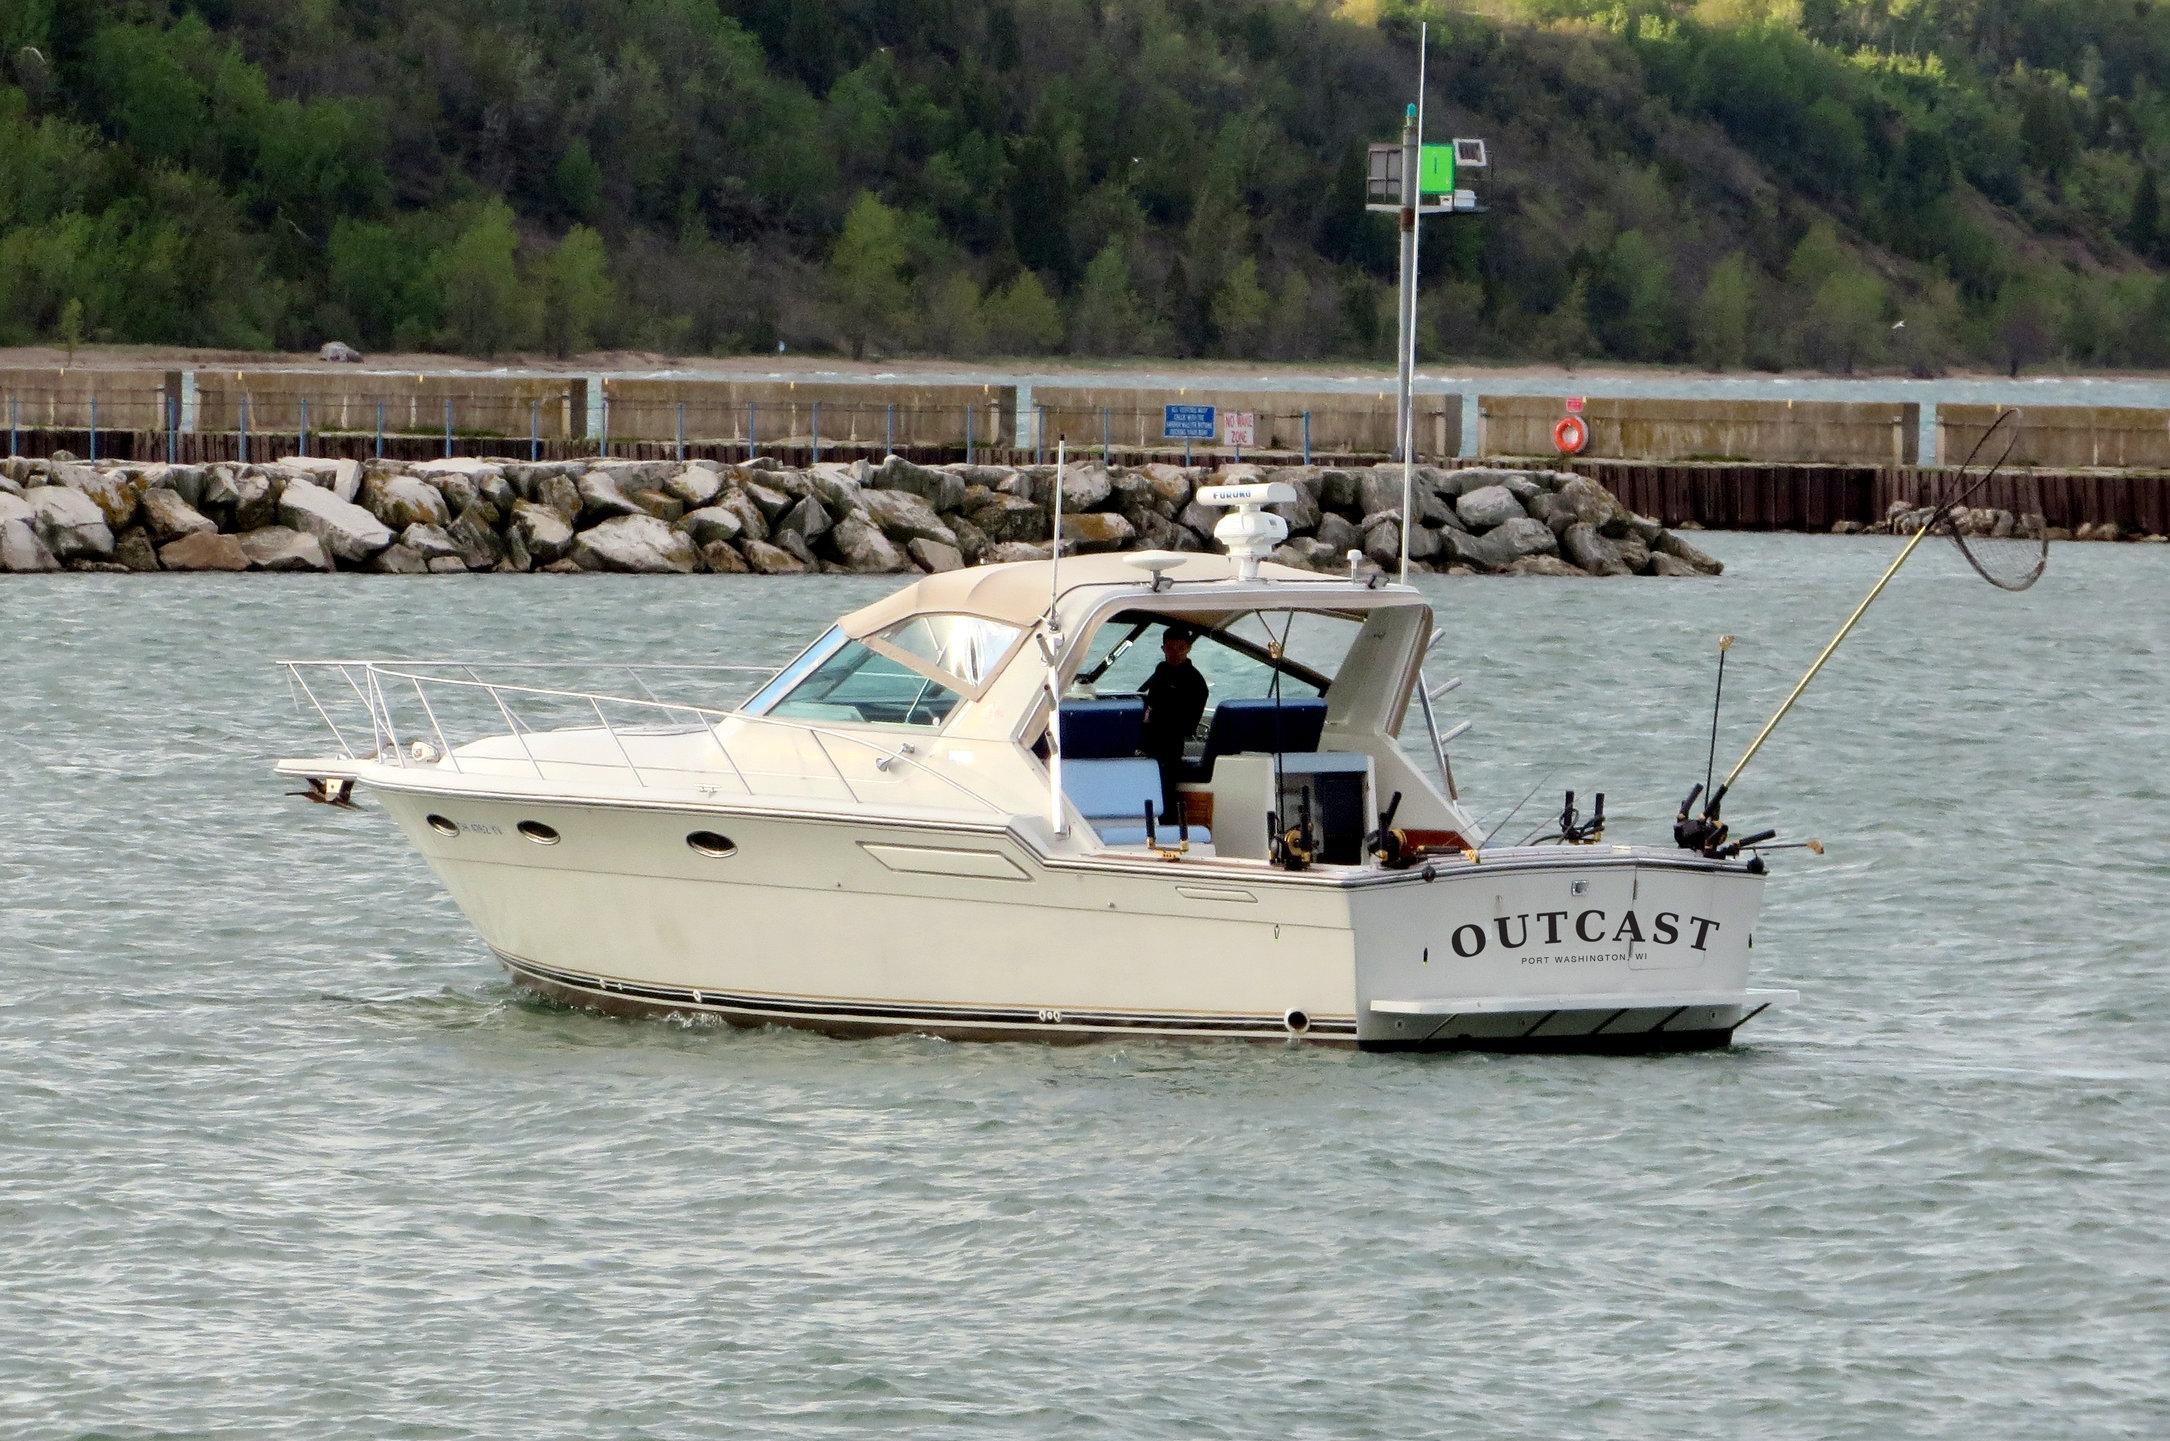 Outcast_Boat-2016_12-29.jpg